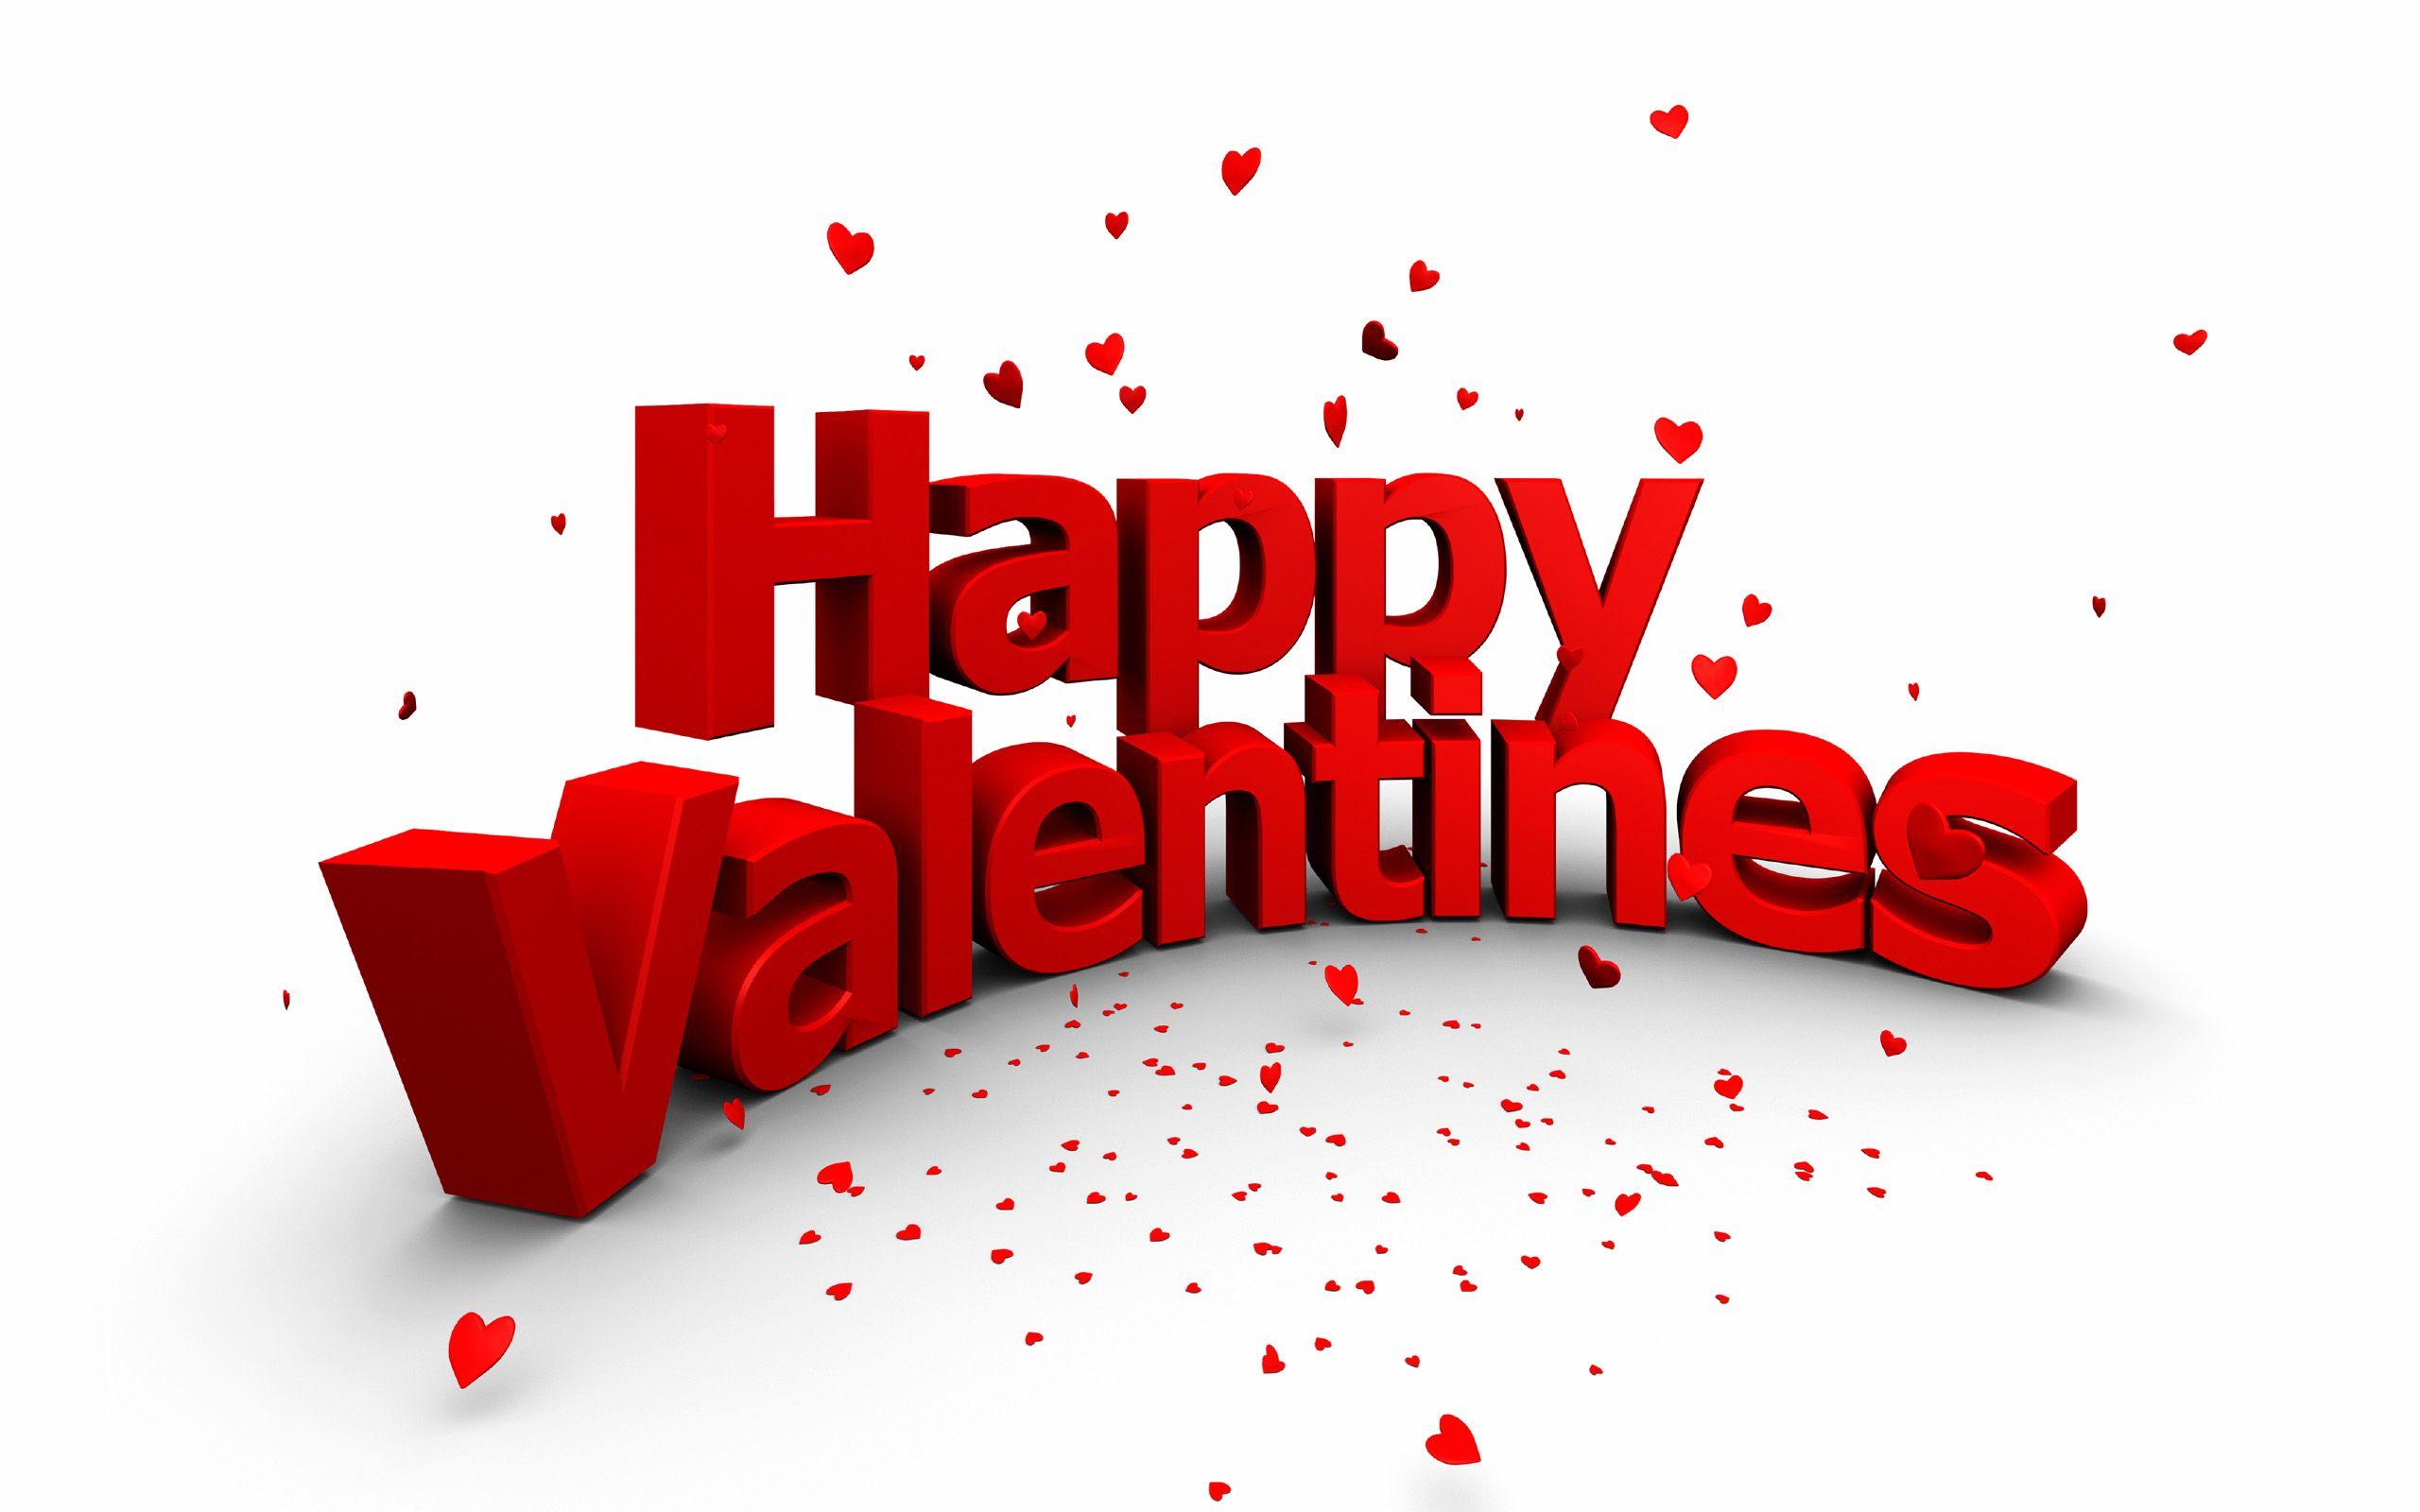 happy valentines hd wide wallpaper - http://imashon/love/happy